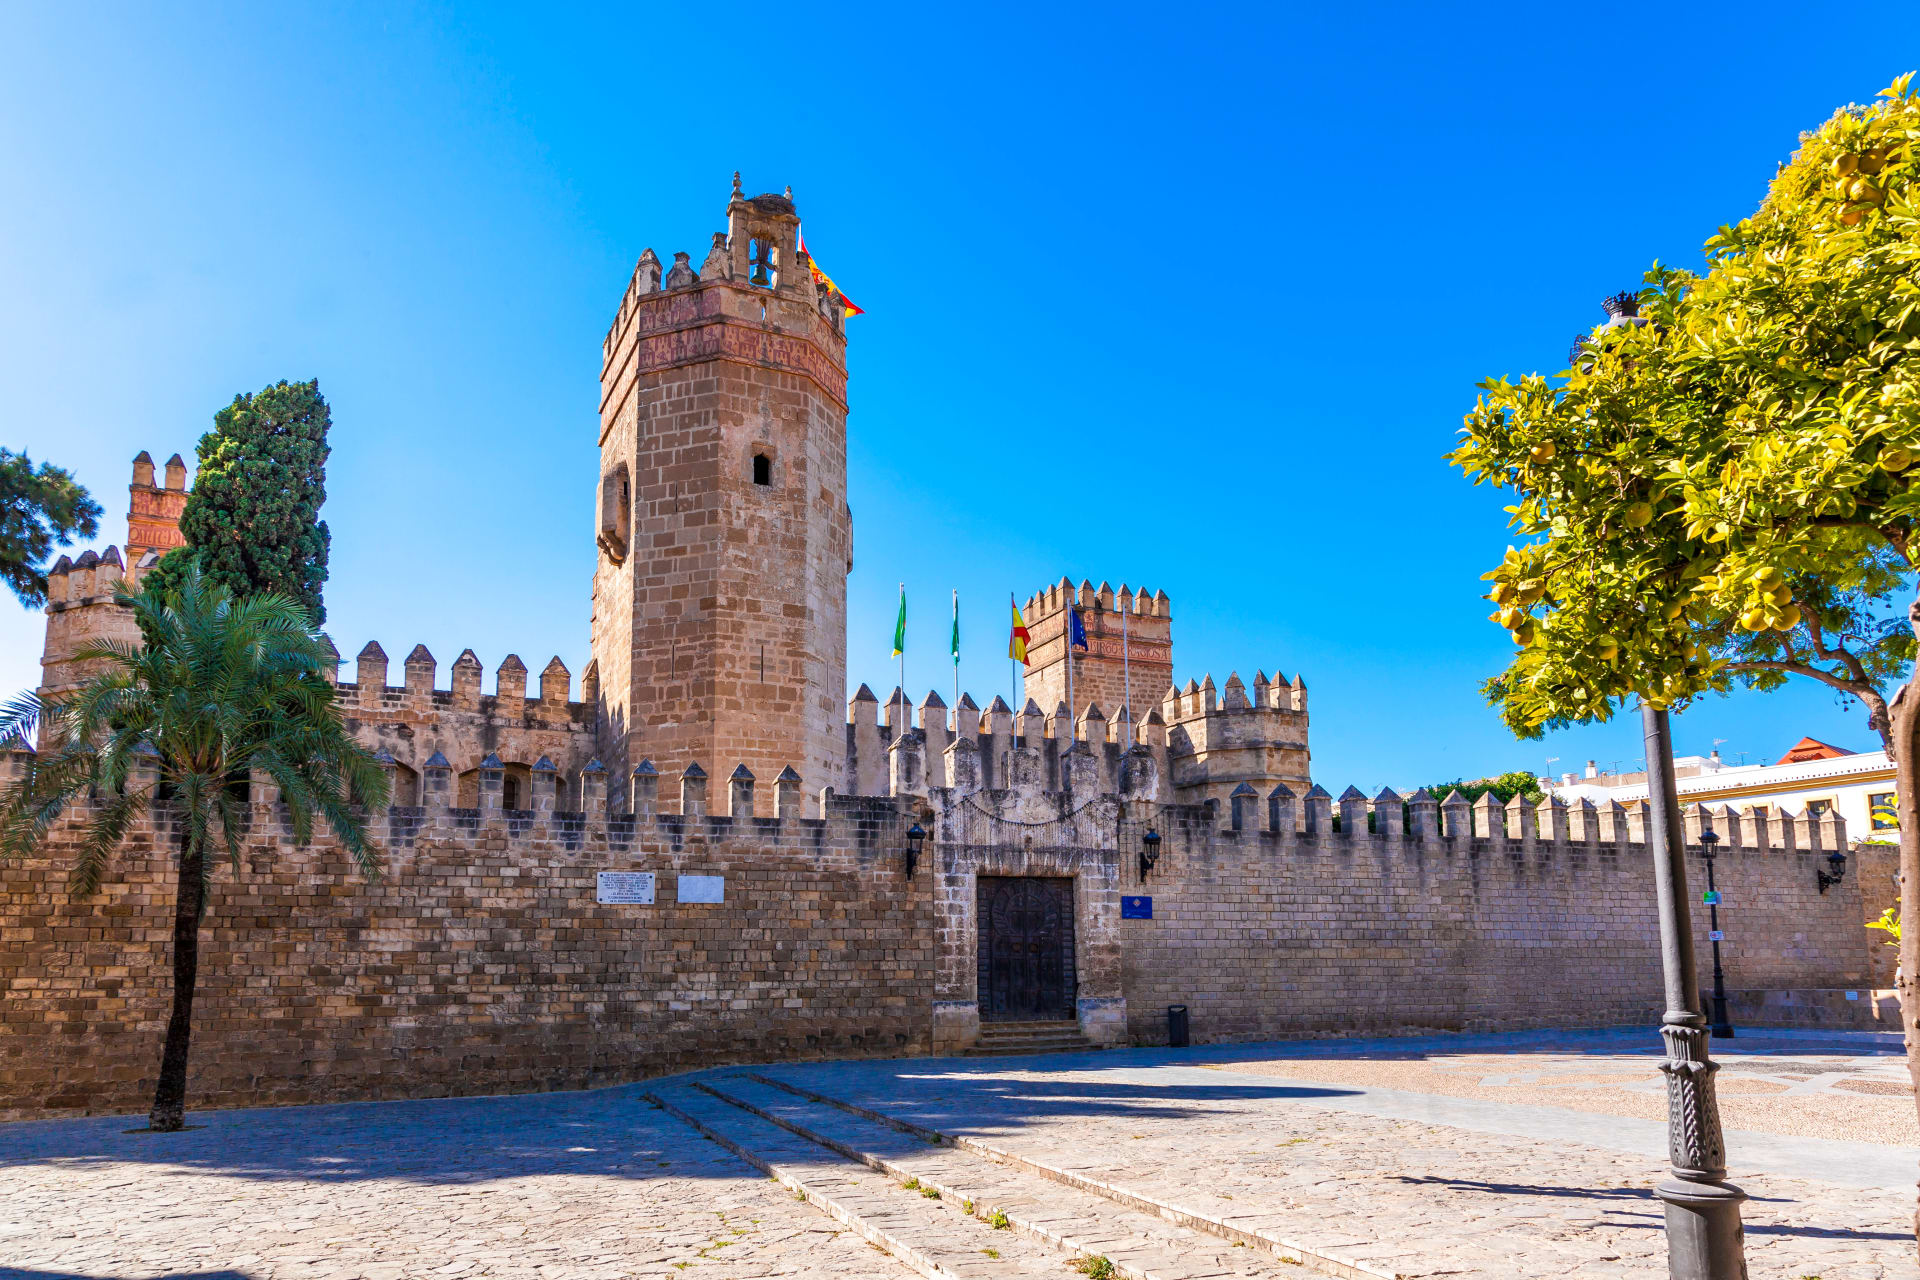 Cádiz - Puerto de Santa Maria, the city of 100 palaces